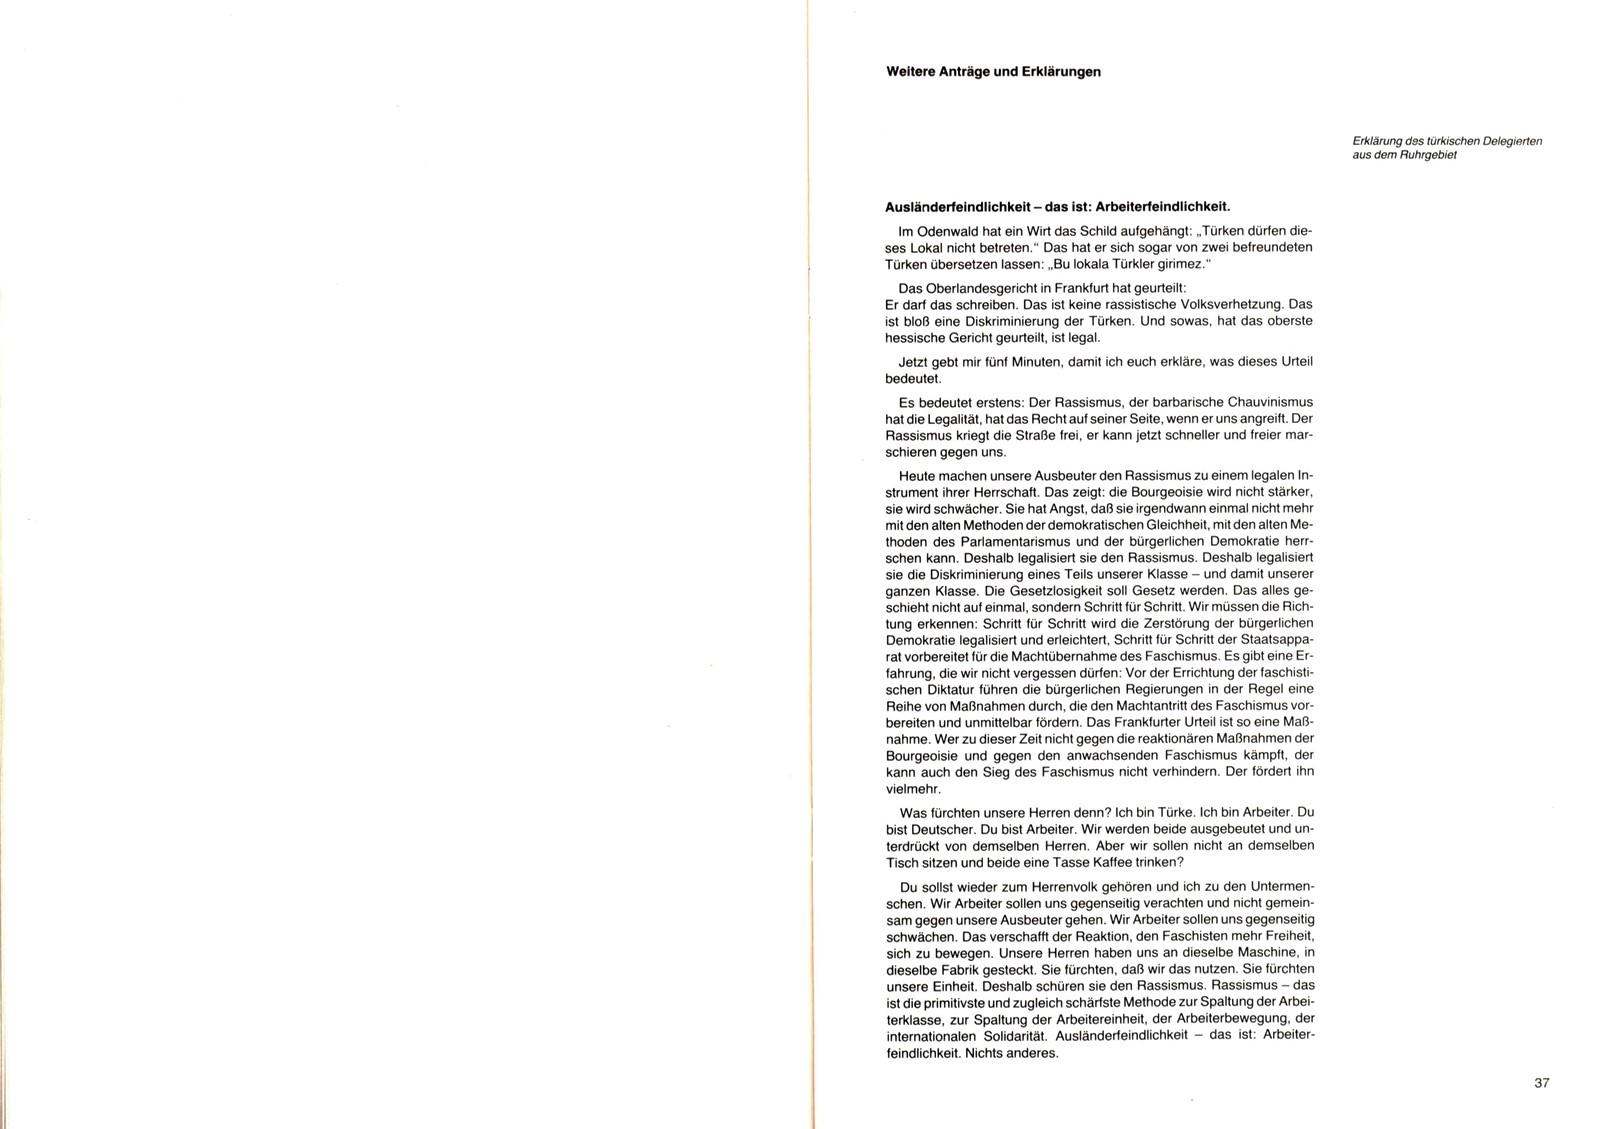 ABG_1985_Beschluesse_IV_Delegiertenkonferenz_20